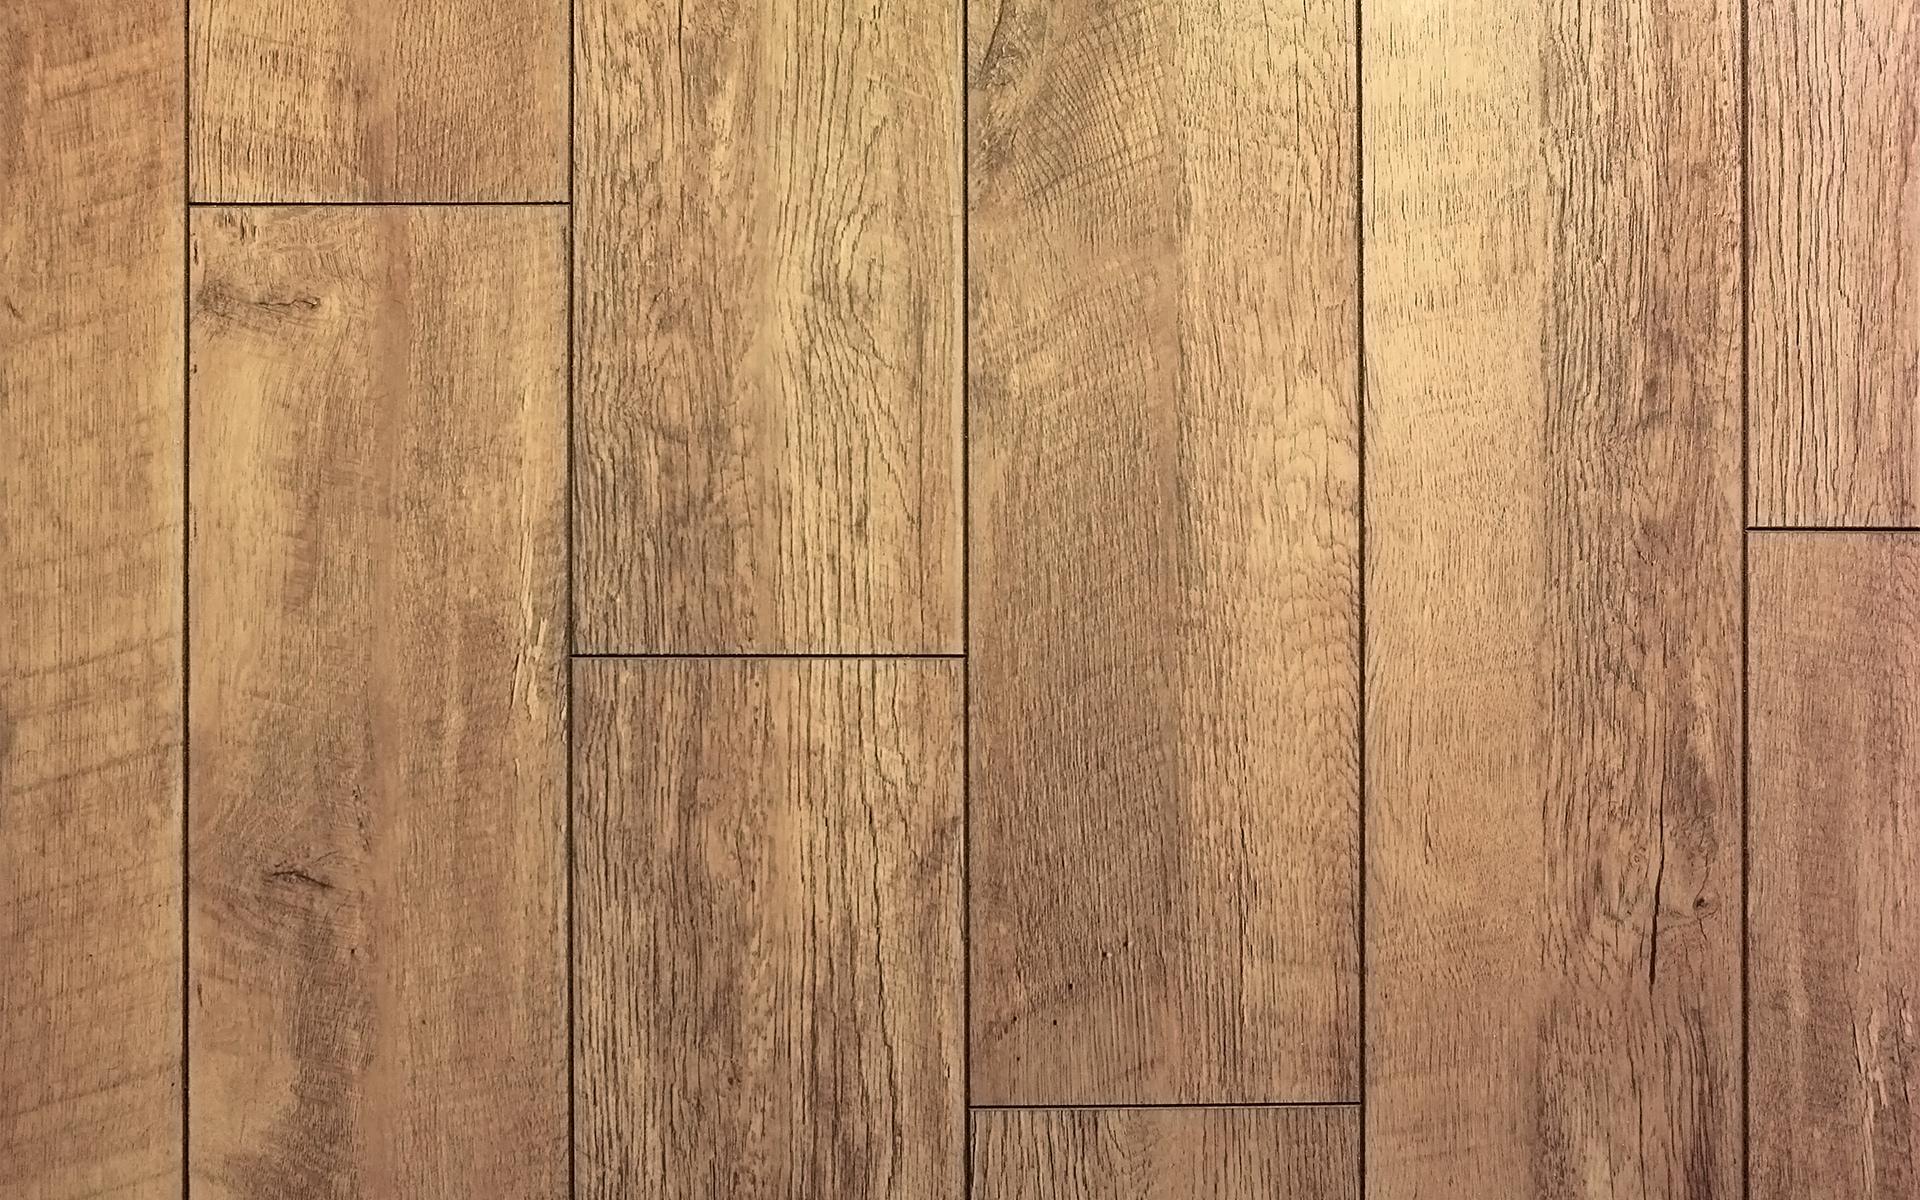 Wood pattern texture wallpaper 1920×1200 50218 WallpaperUP # Vers De Bois Parquet